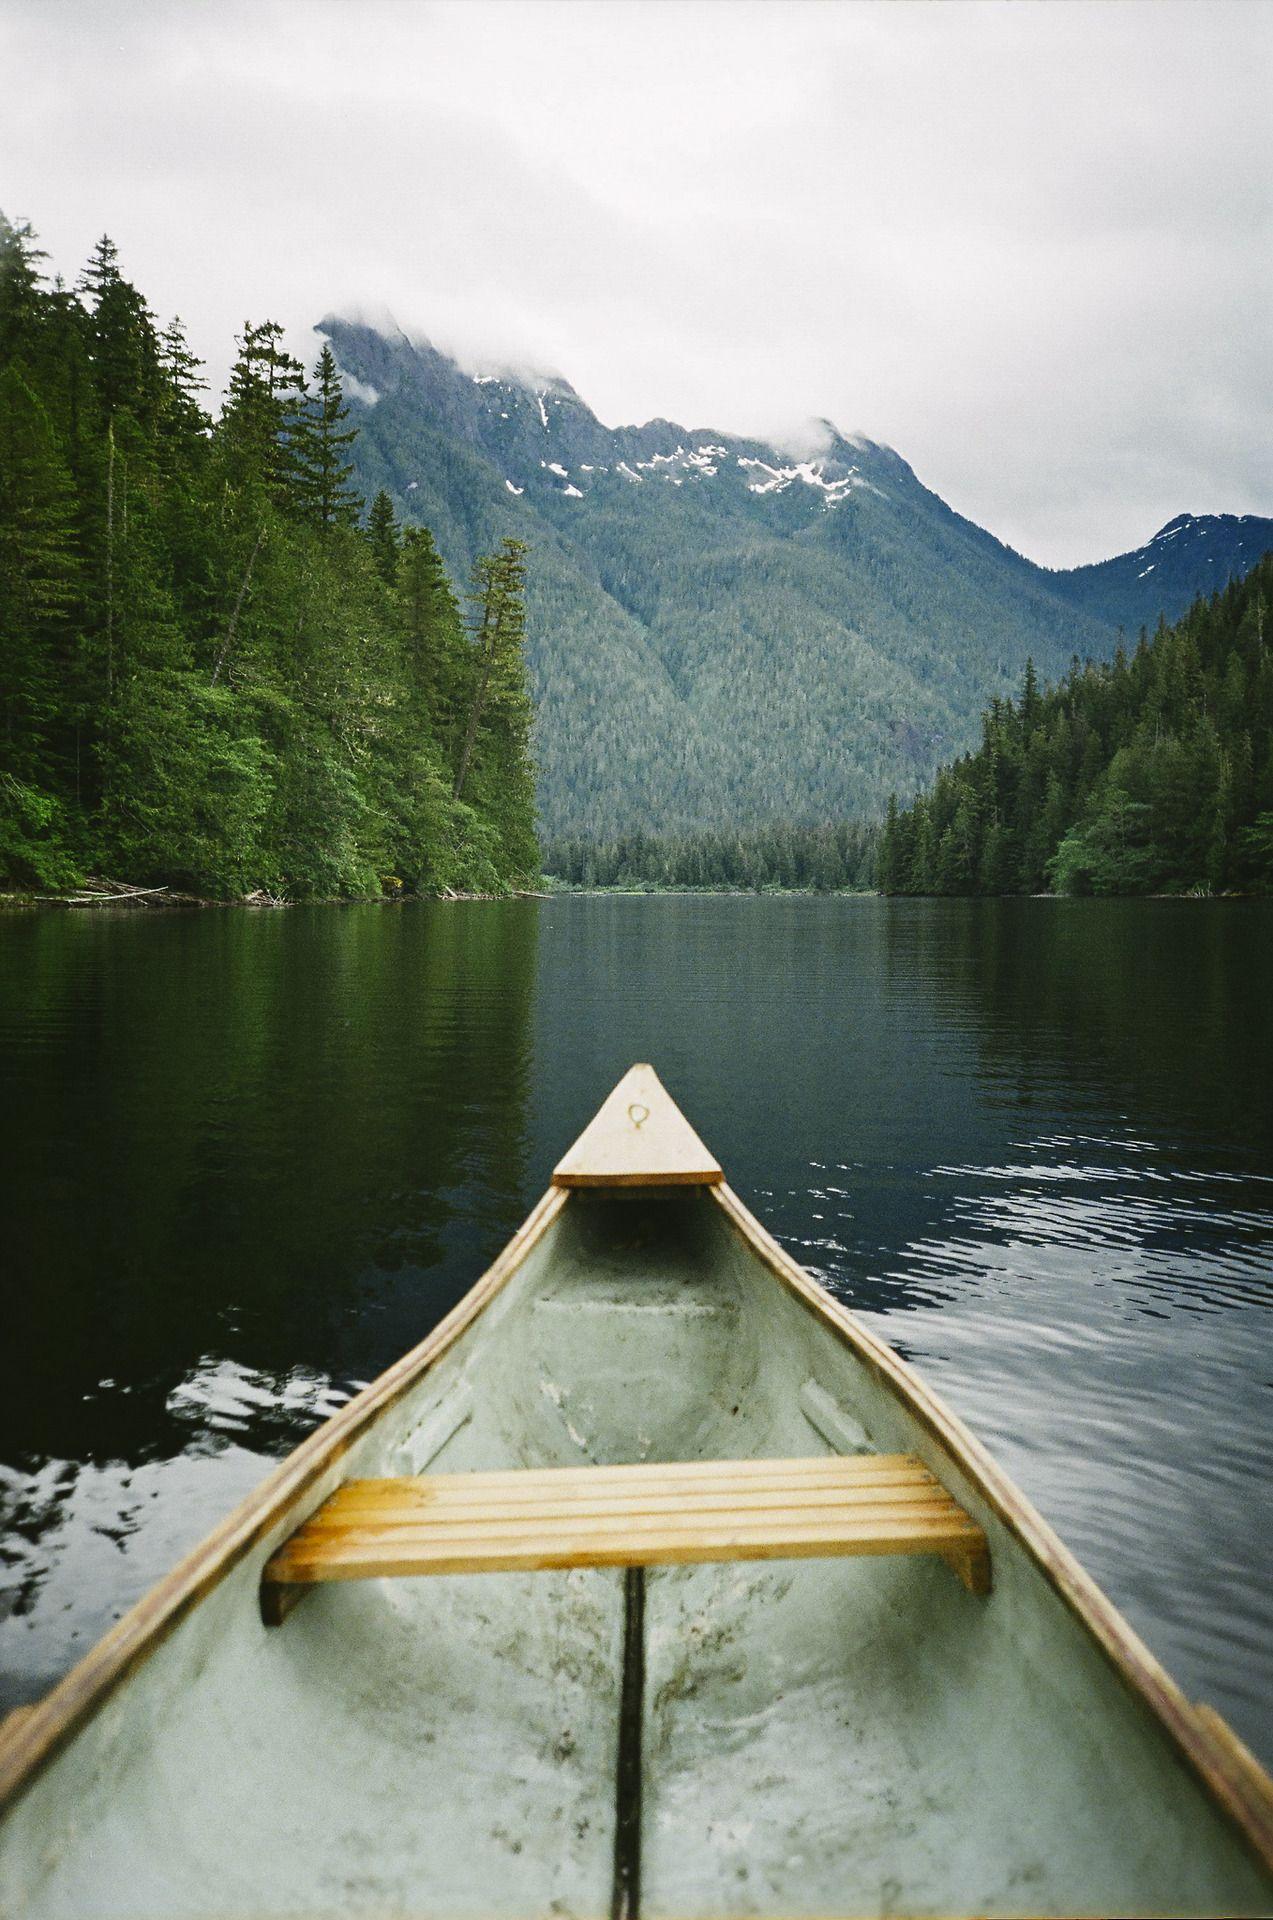 Lake Vibes Camping Wallpaper Nature Wallpaper Camping Experience Wallpaper green lake boat mountain fog